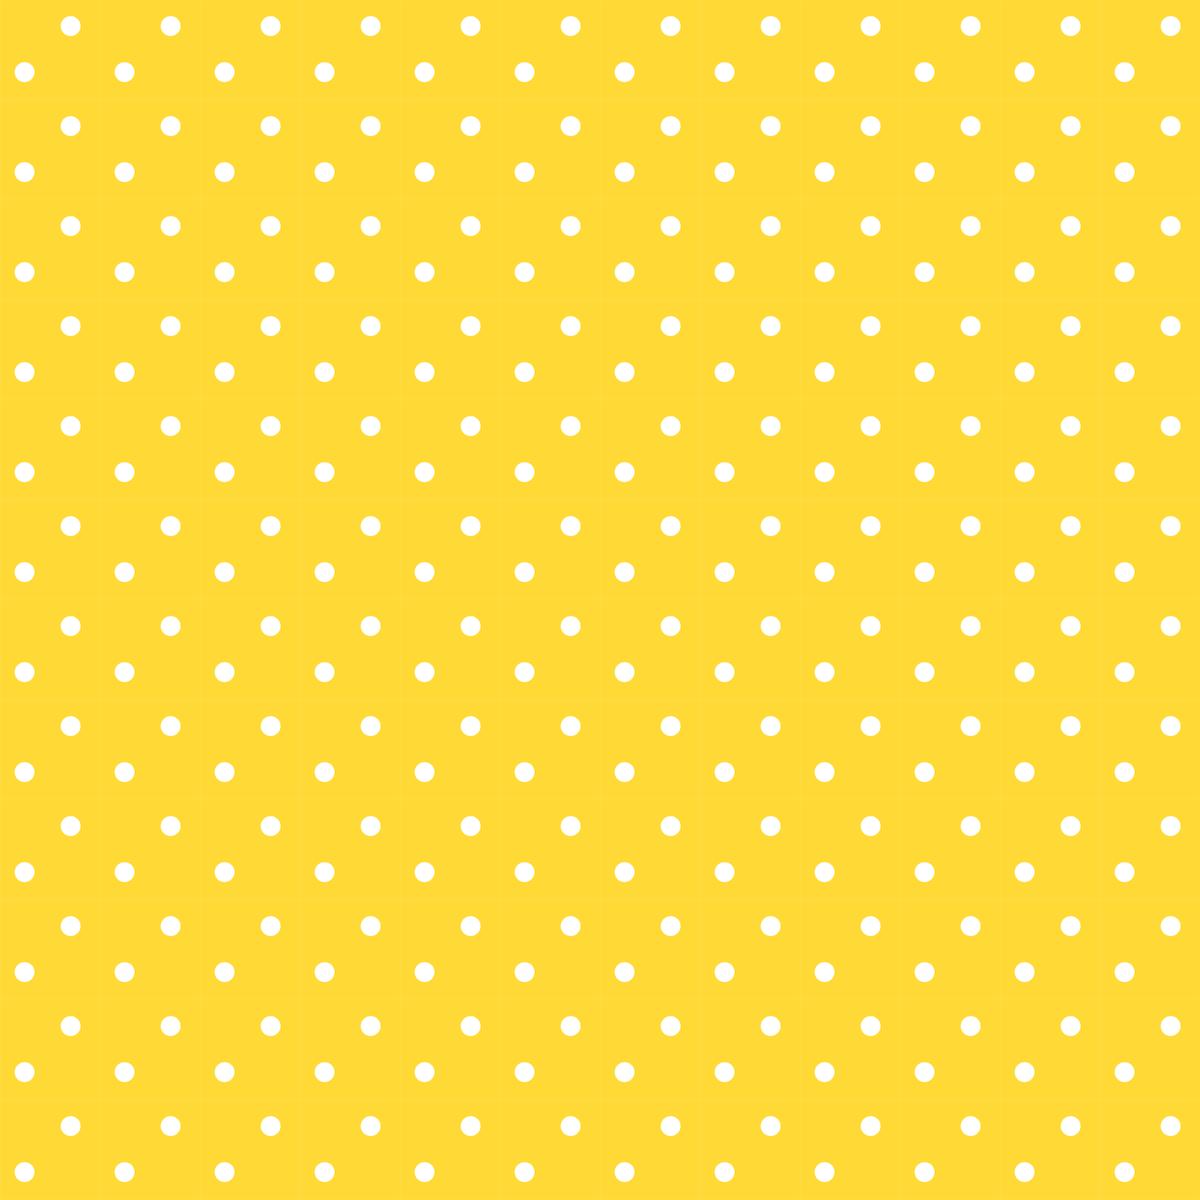 Free Polka Dot Background PNG - 153088